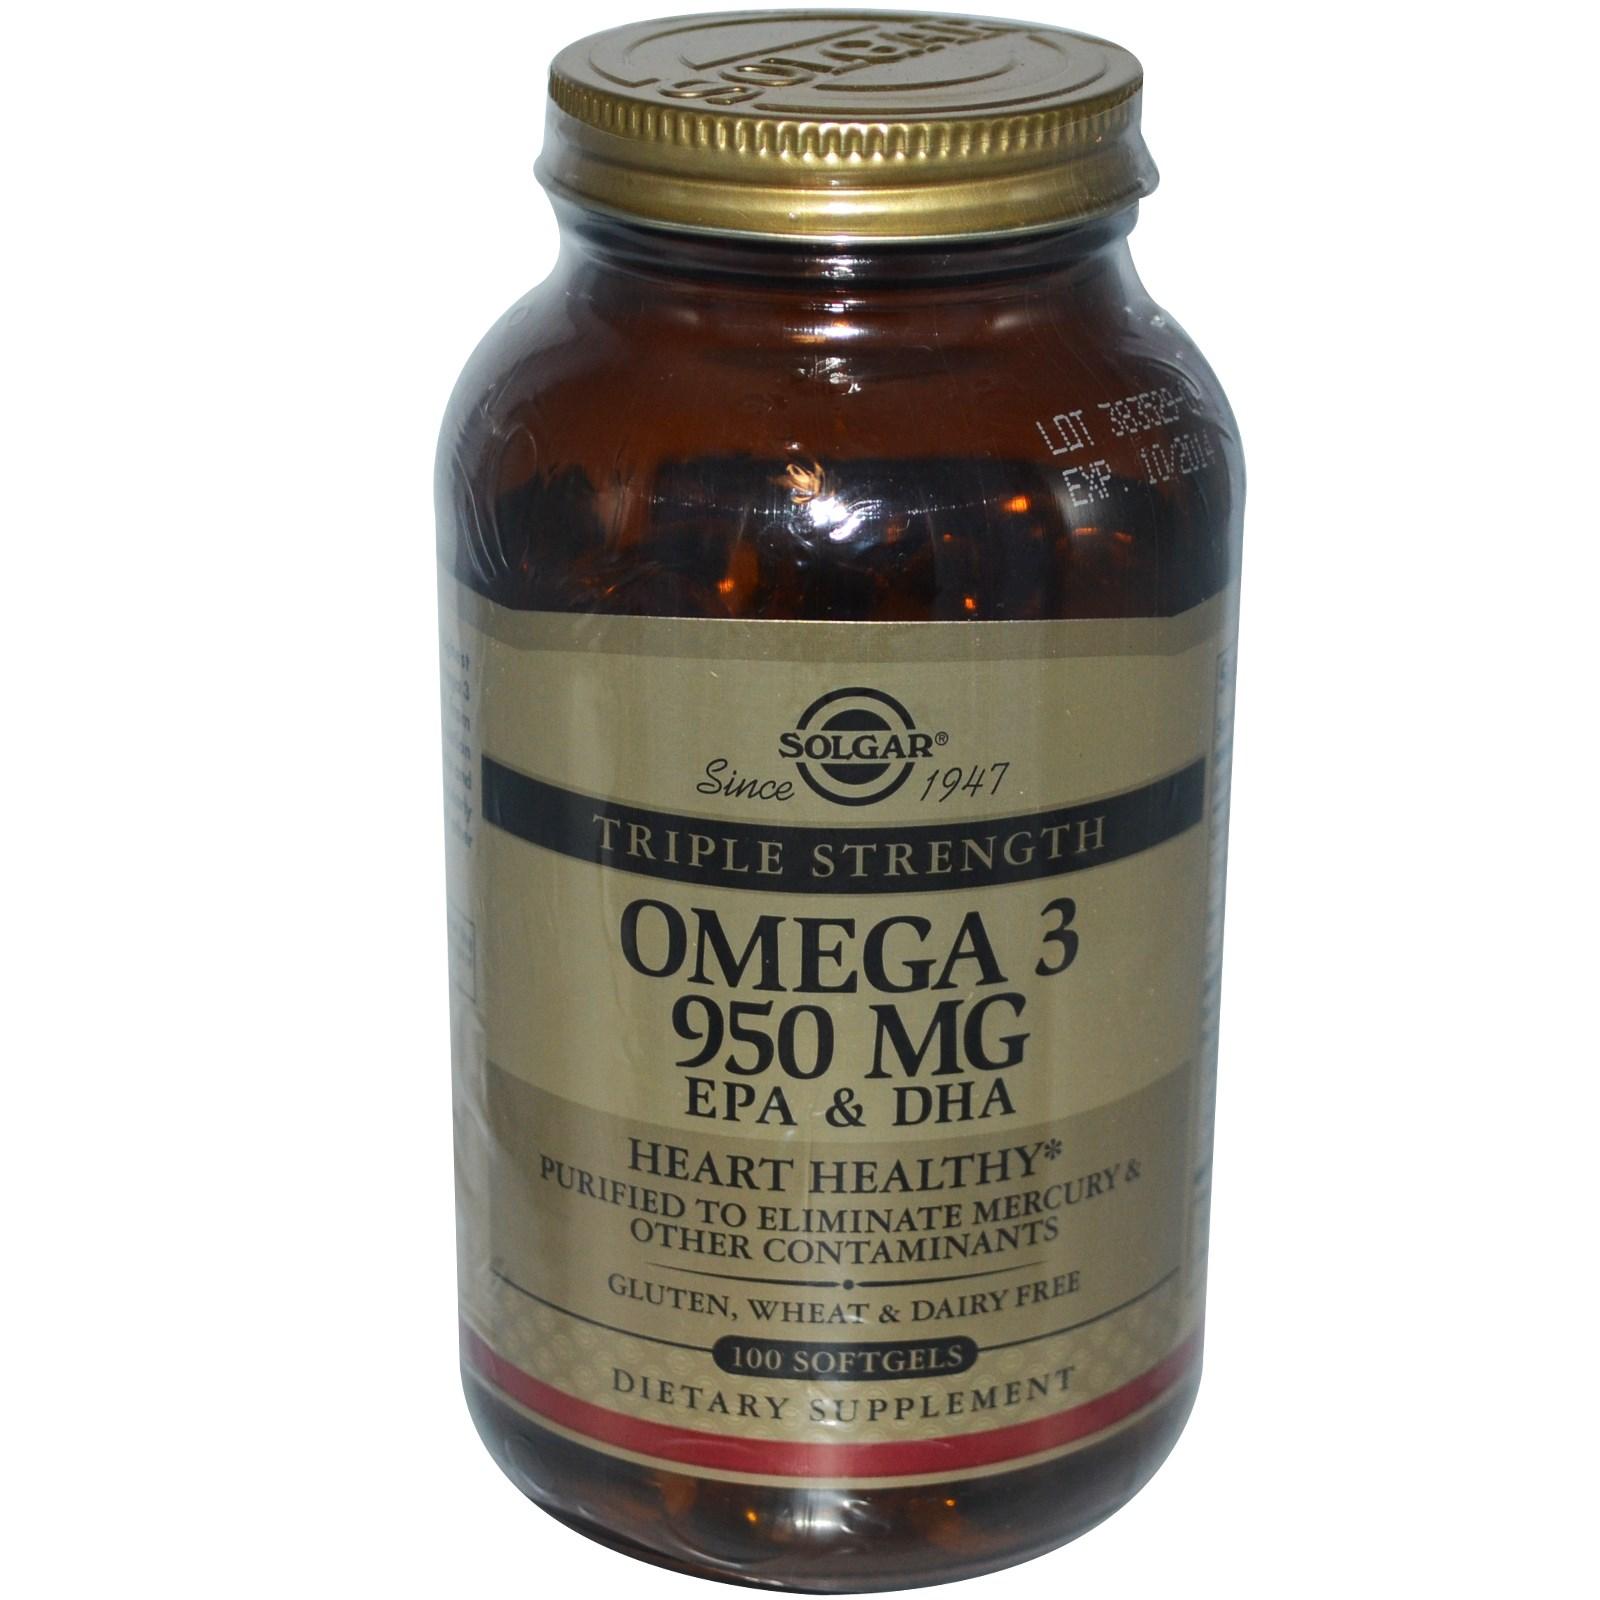 Omega-3 EPA & DHA, Triple Strength, hiệu Solgar, lọ 950 mg, 100 viên nang mềm